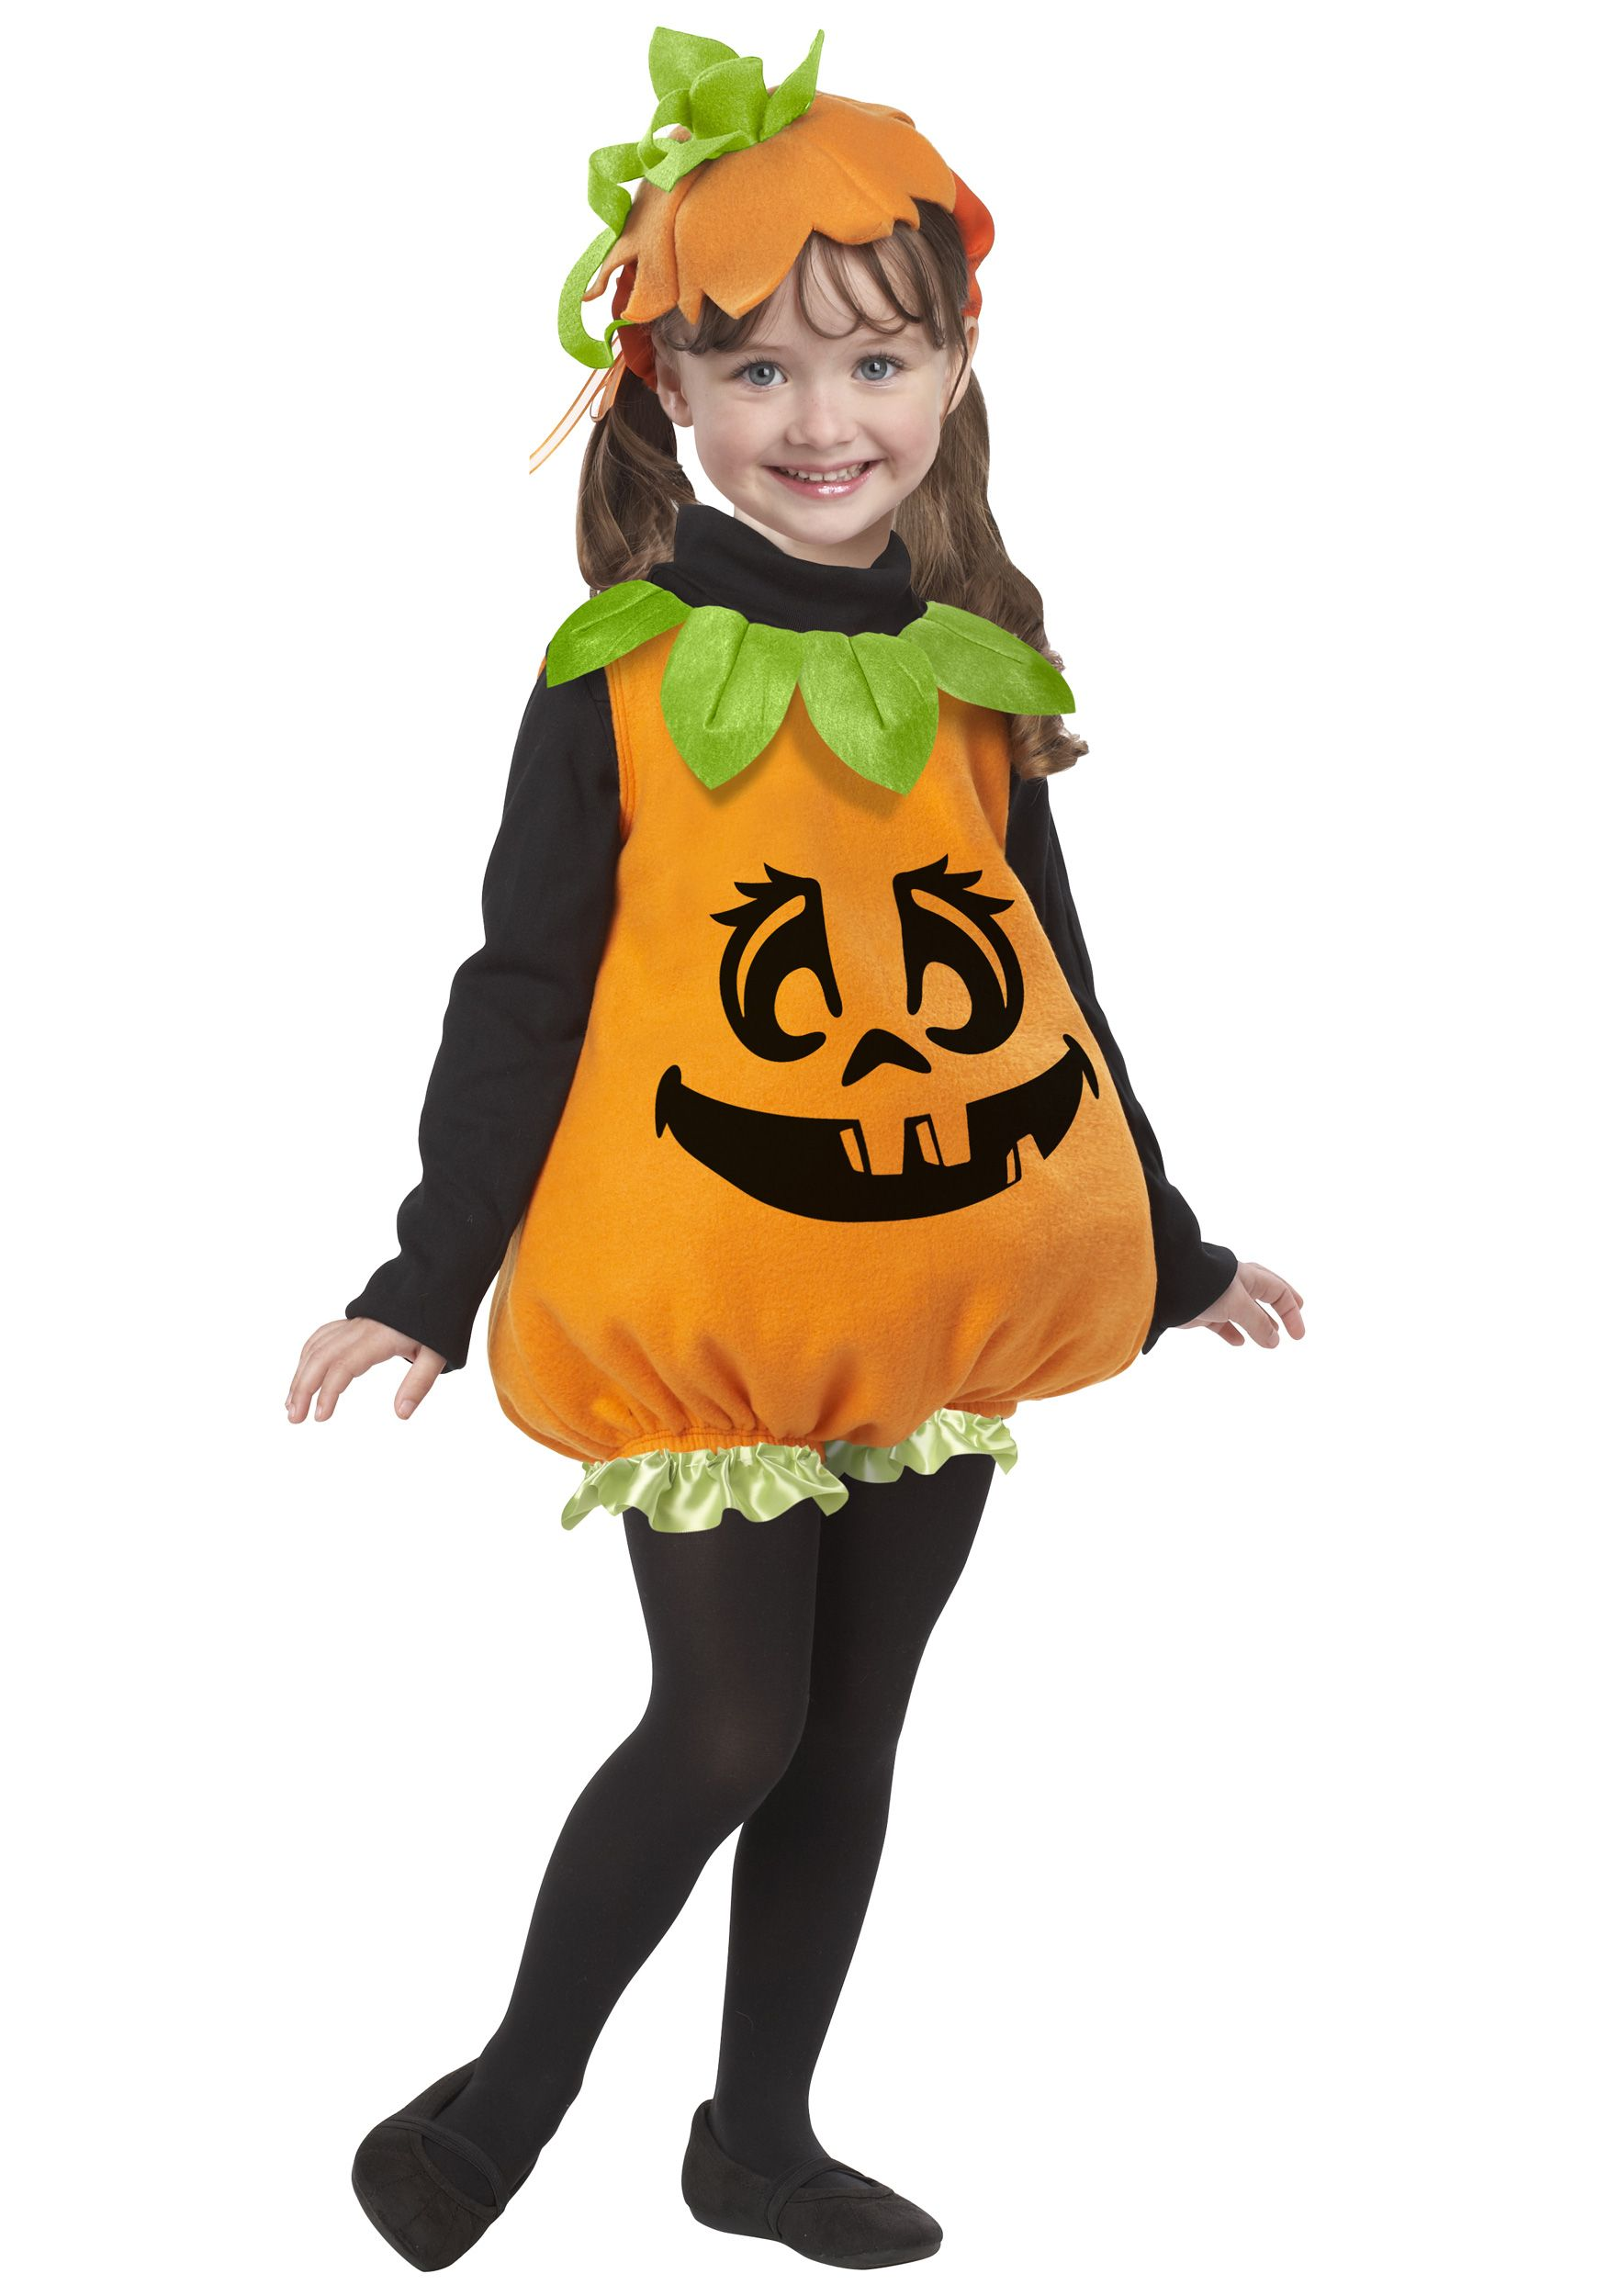 Toddler Pumpkin Girl Costume  sc 1 st  Pinterest & Toddler Pumpkin Girl Costume | Kids Costume | Pinterest | Costumes ...